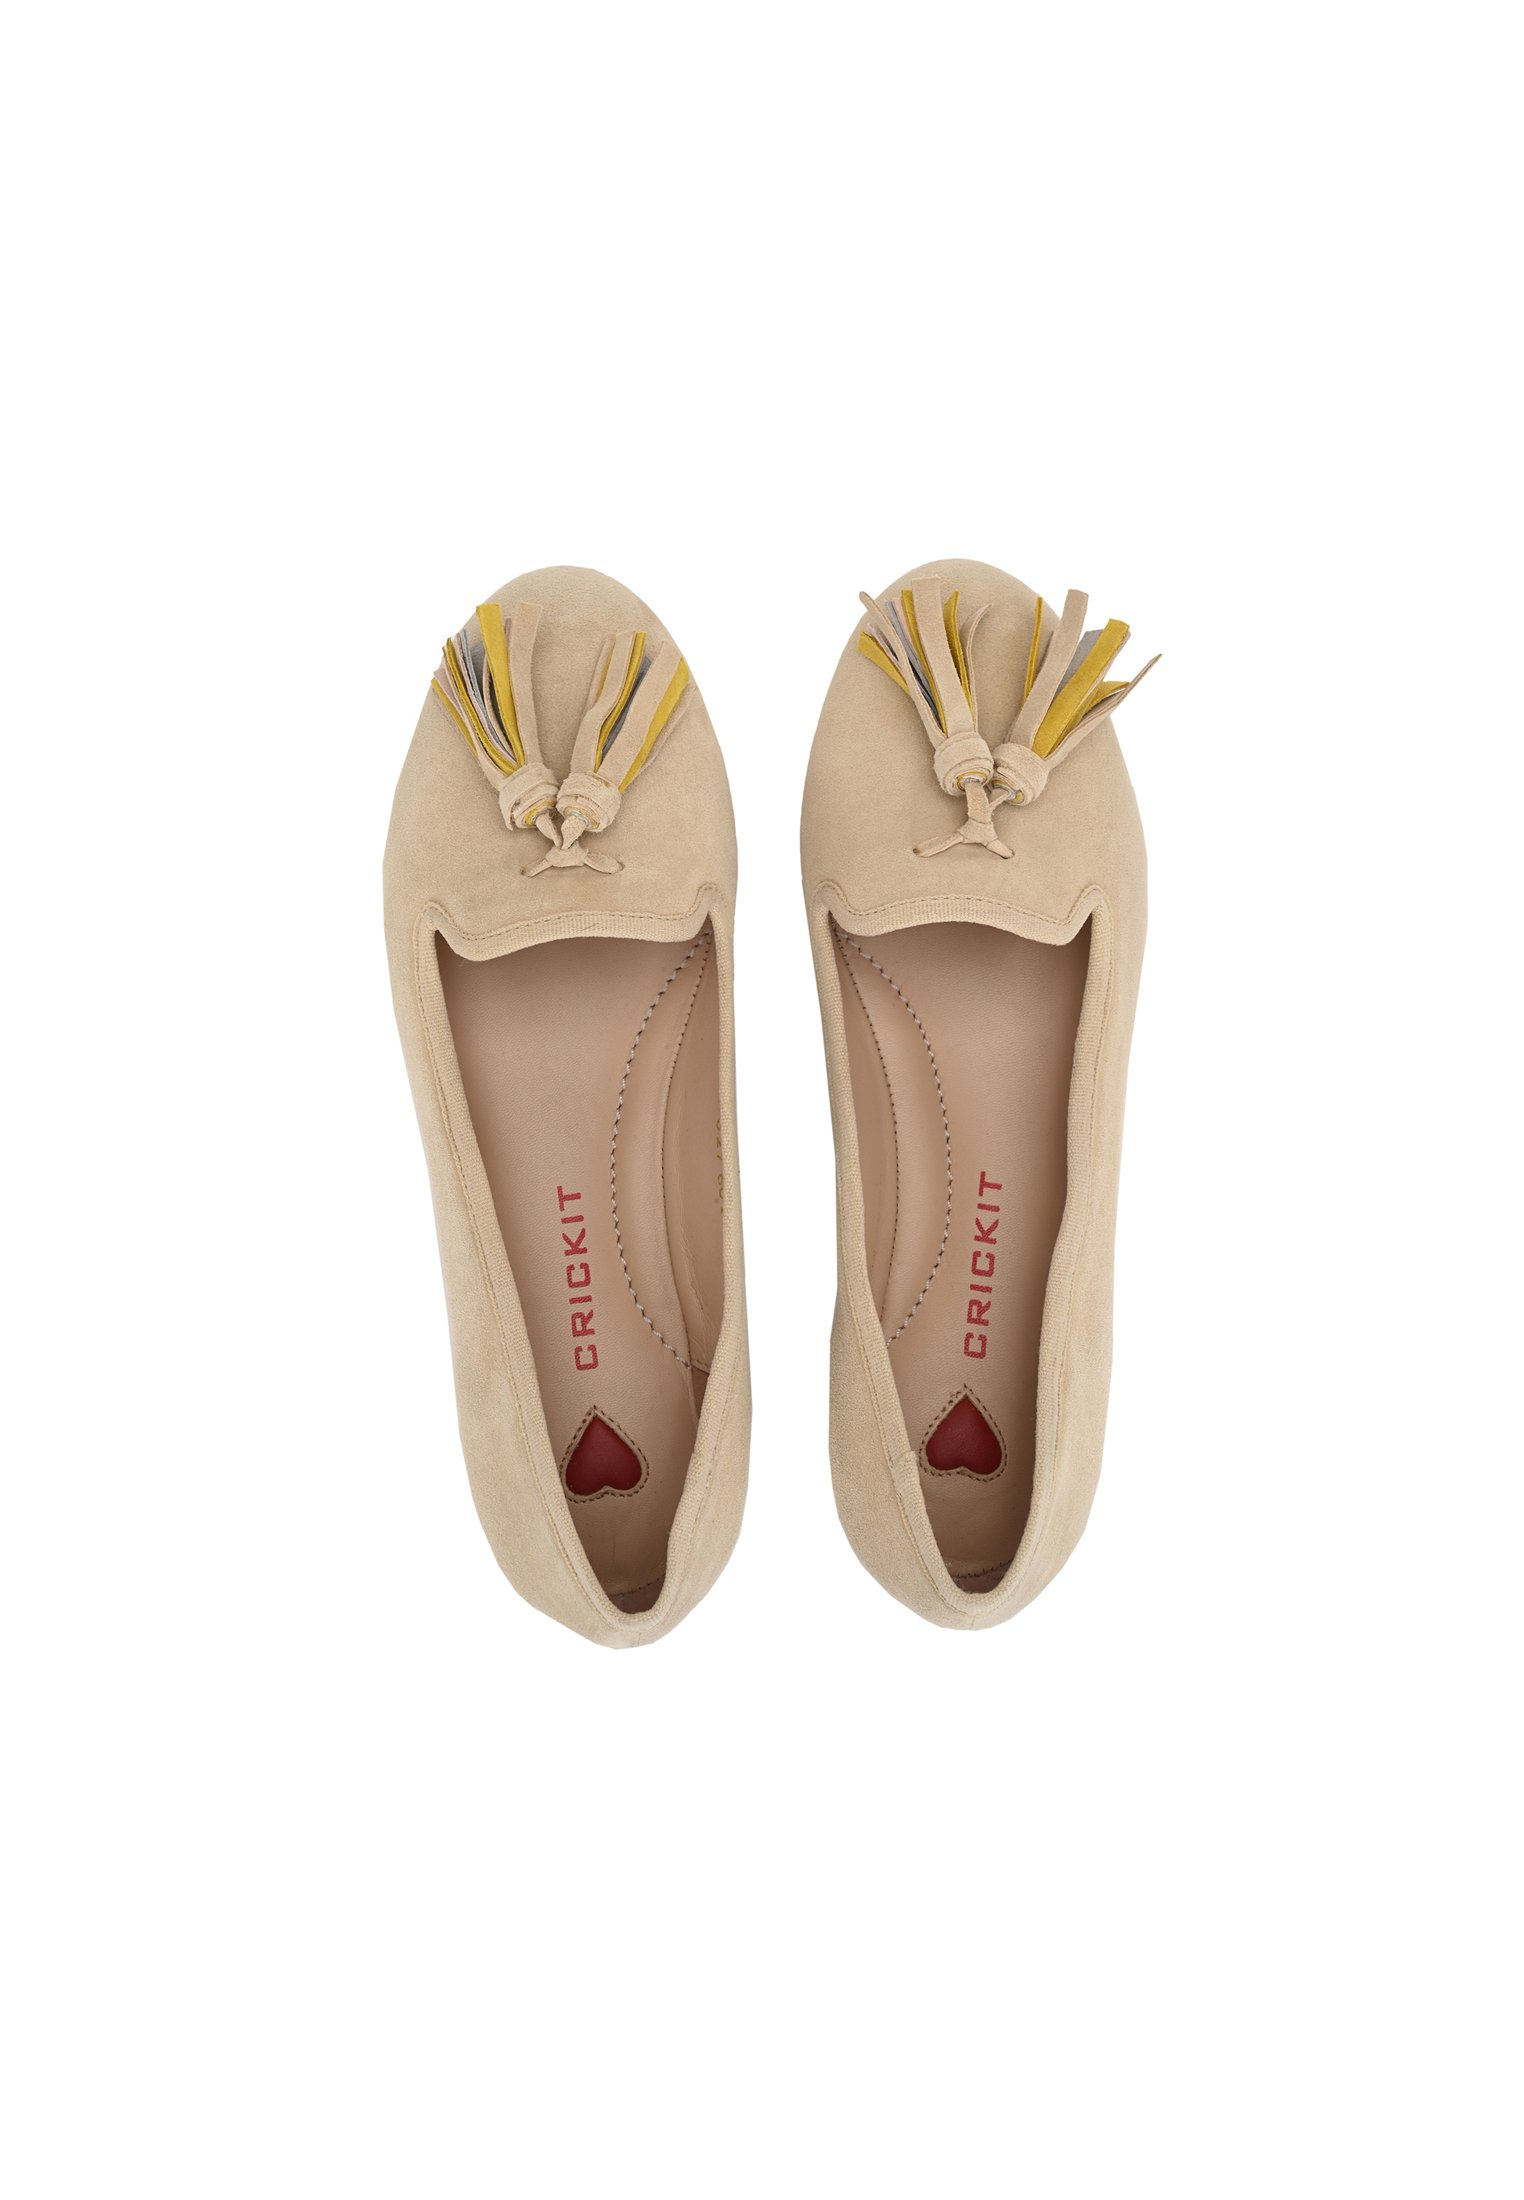 Damen PANTY LOVESOME LACE - Klassischer  Ballerina